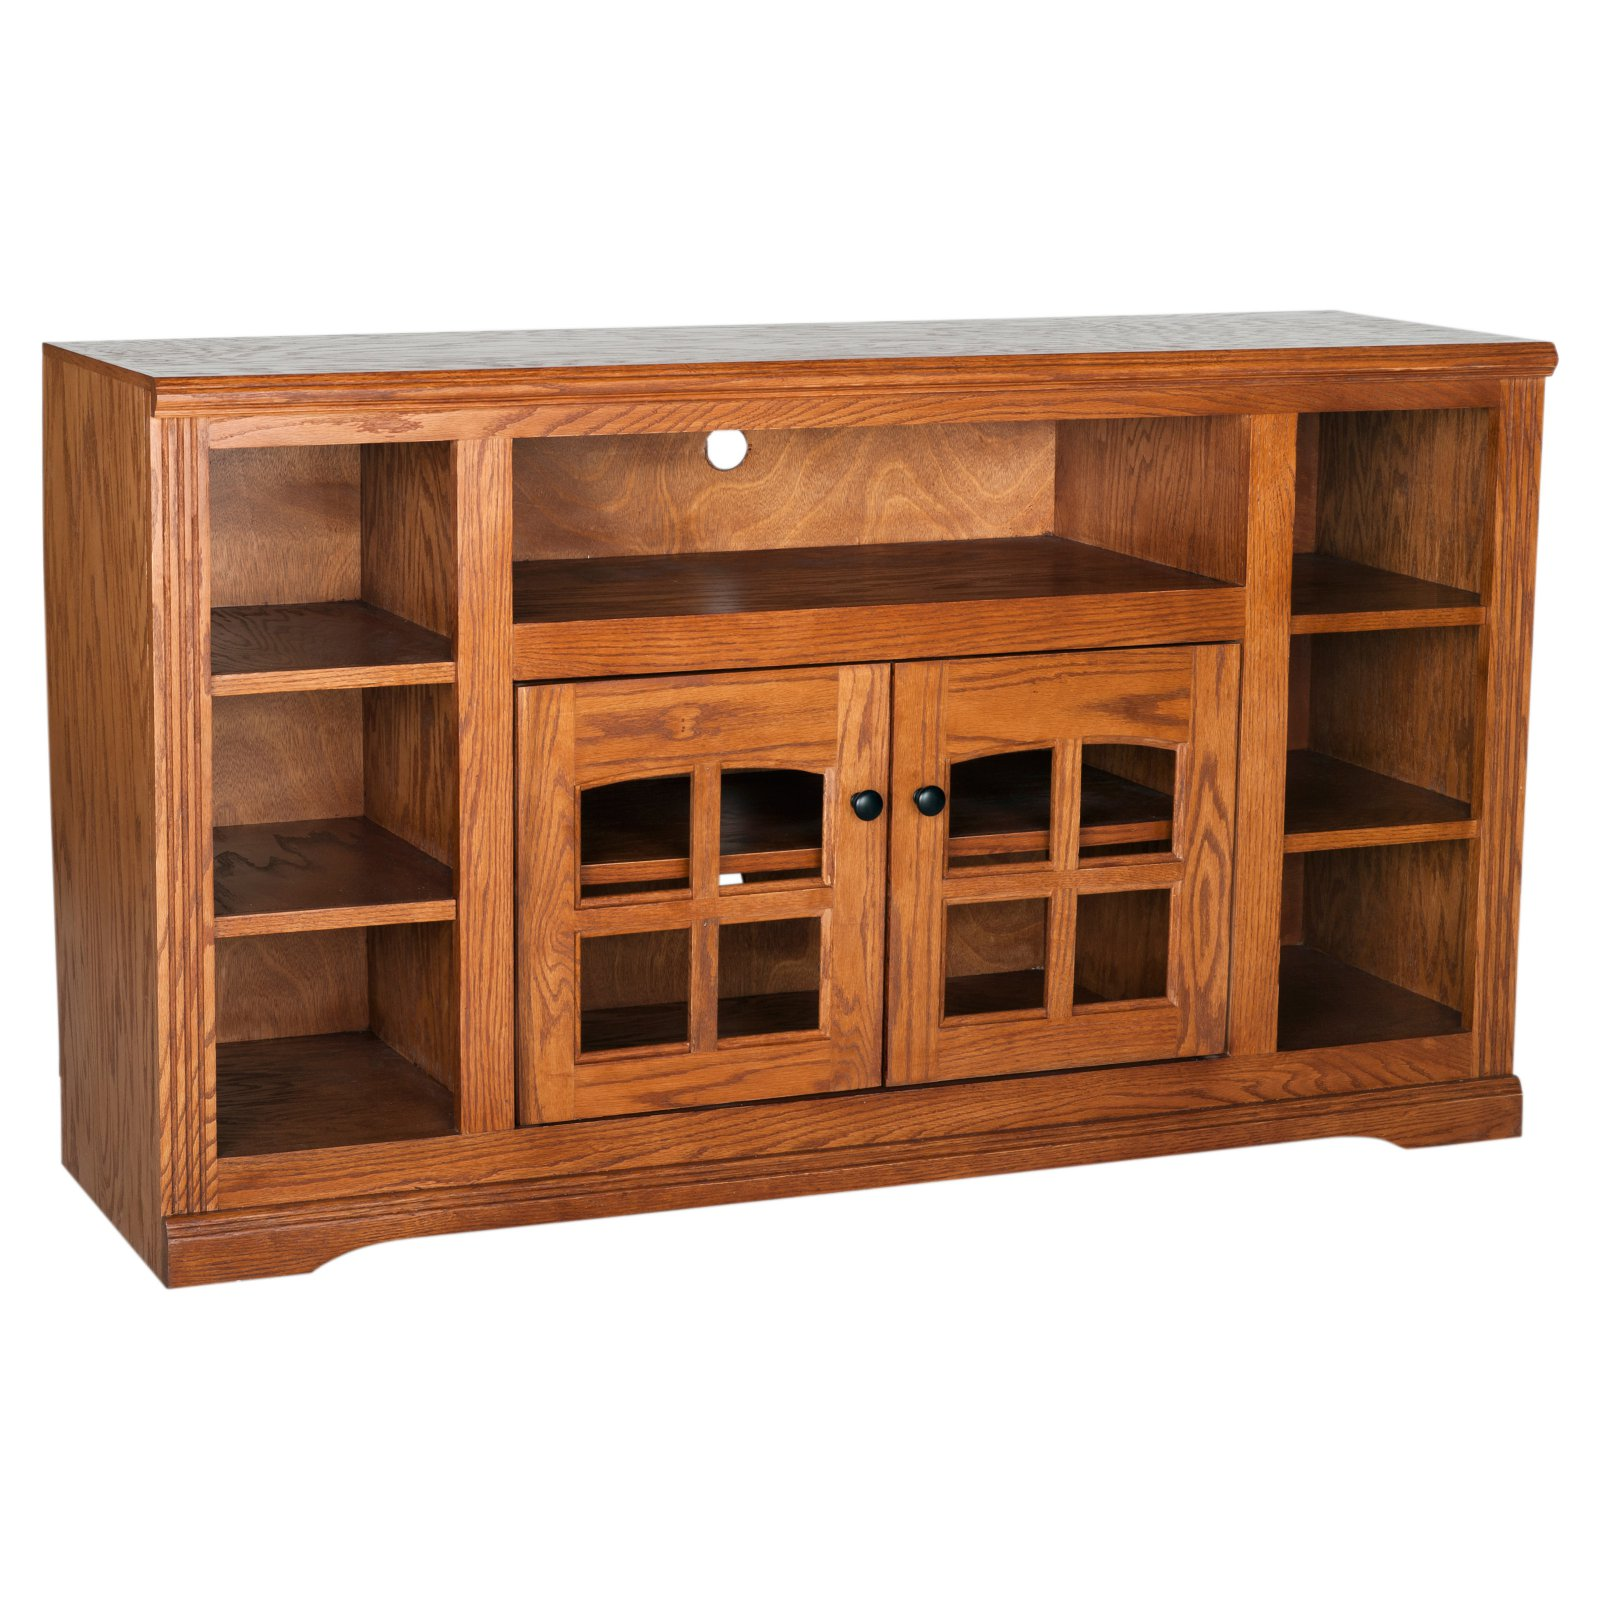 Eagle Furniture Oak Ridge 55 in. Plain Glass Thin-Screen TV Stand